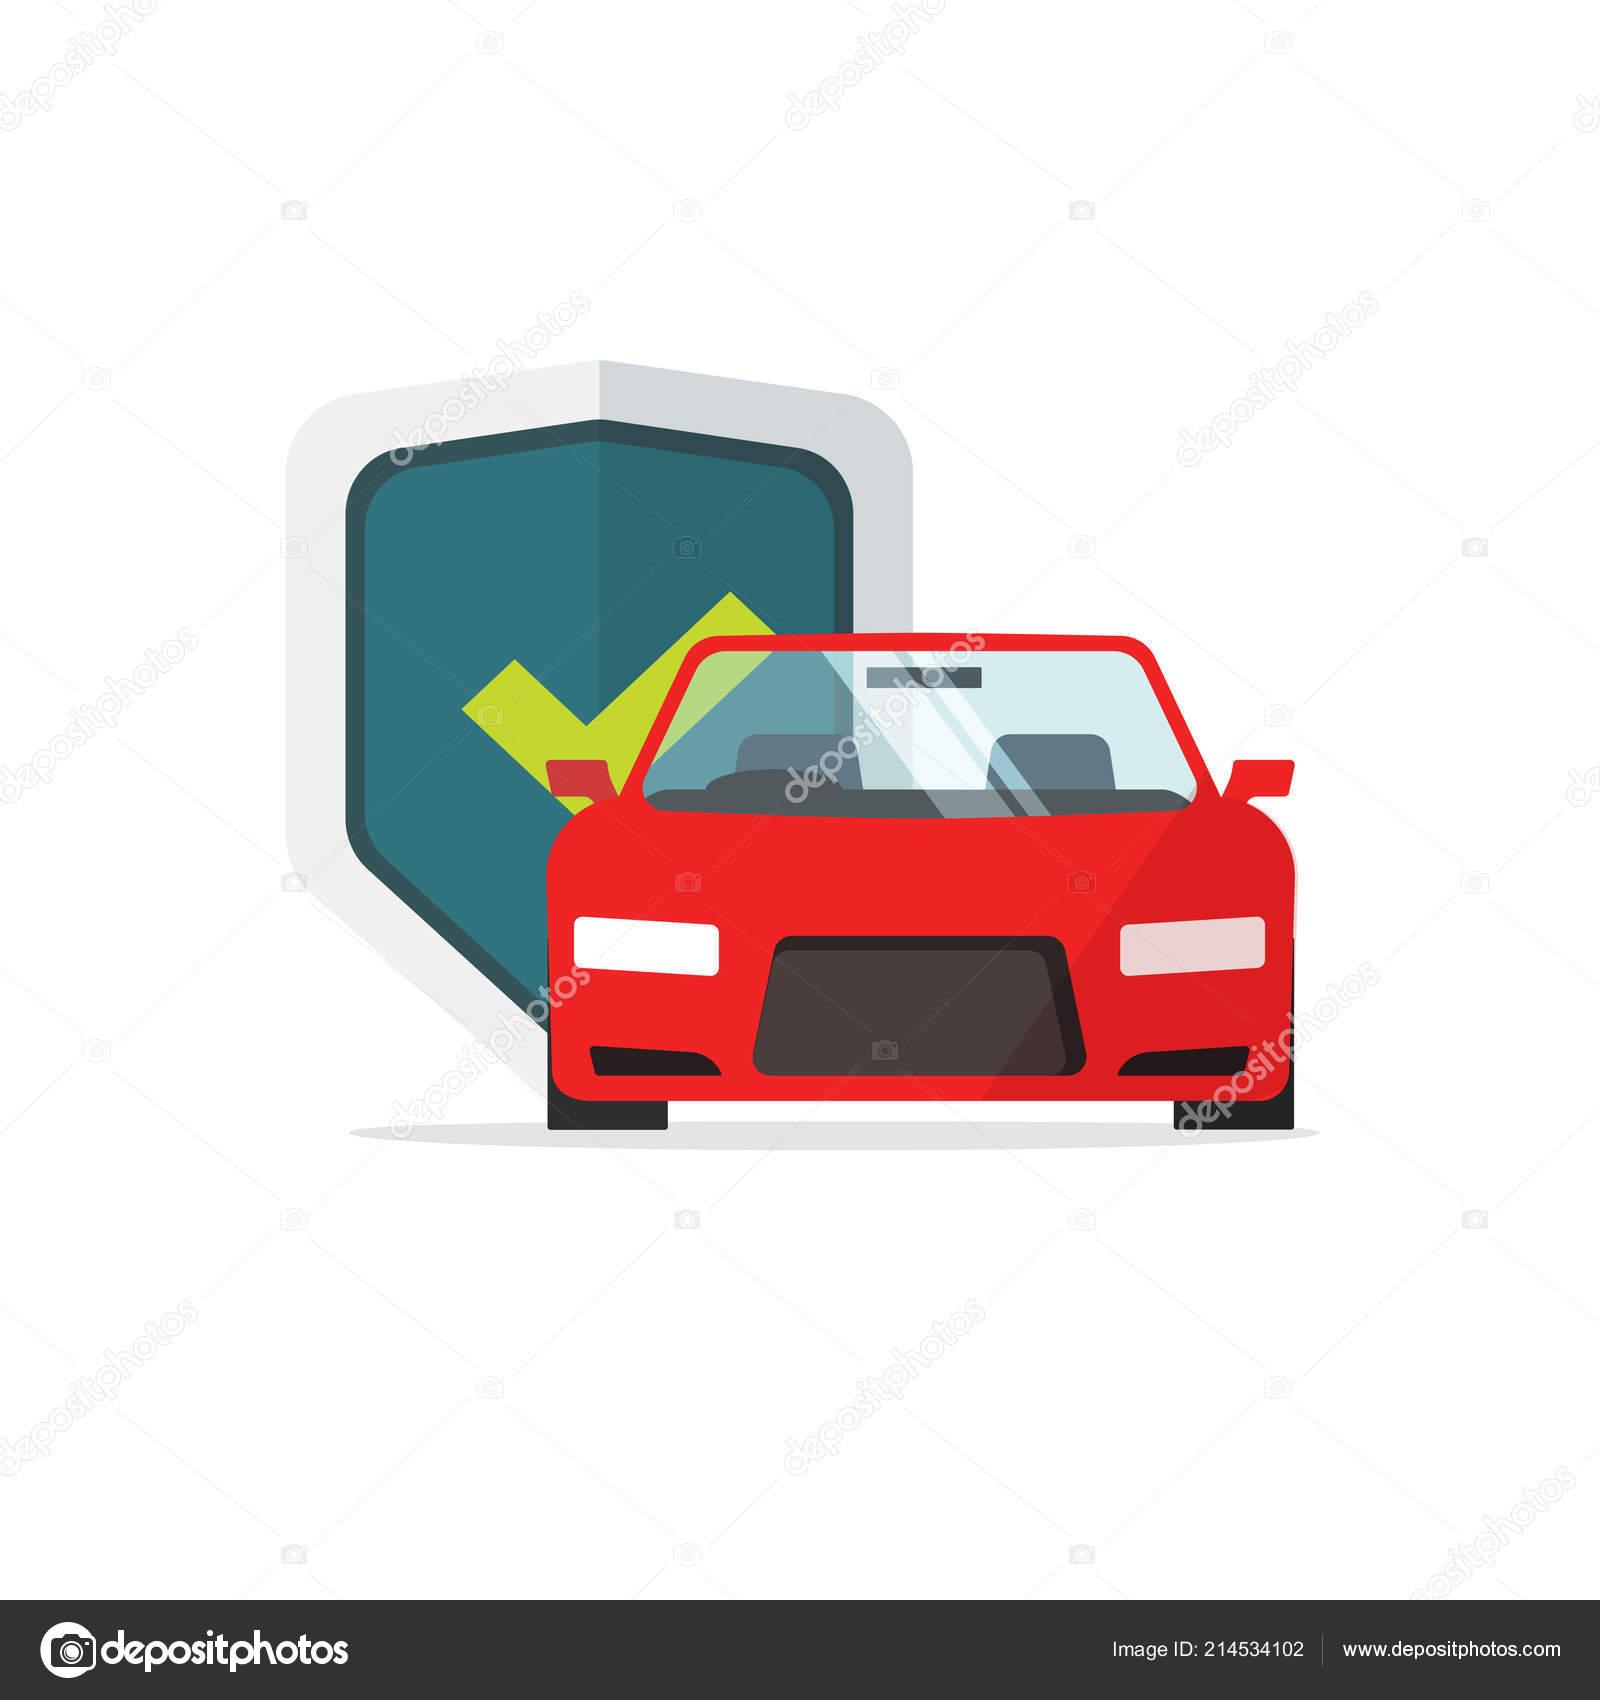 Auto Schutz Vektor Illustration Flache Cartoon Auto Mit Schild